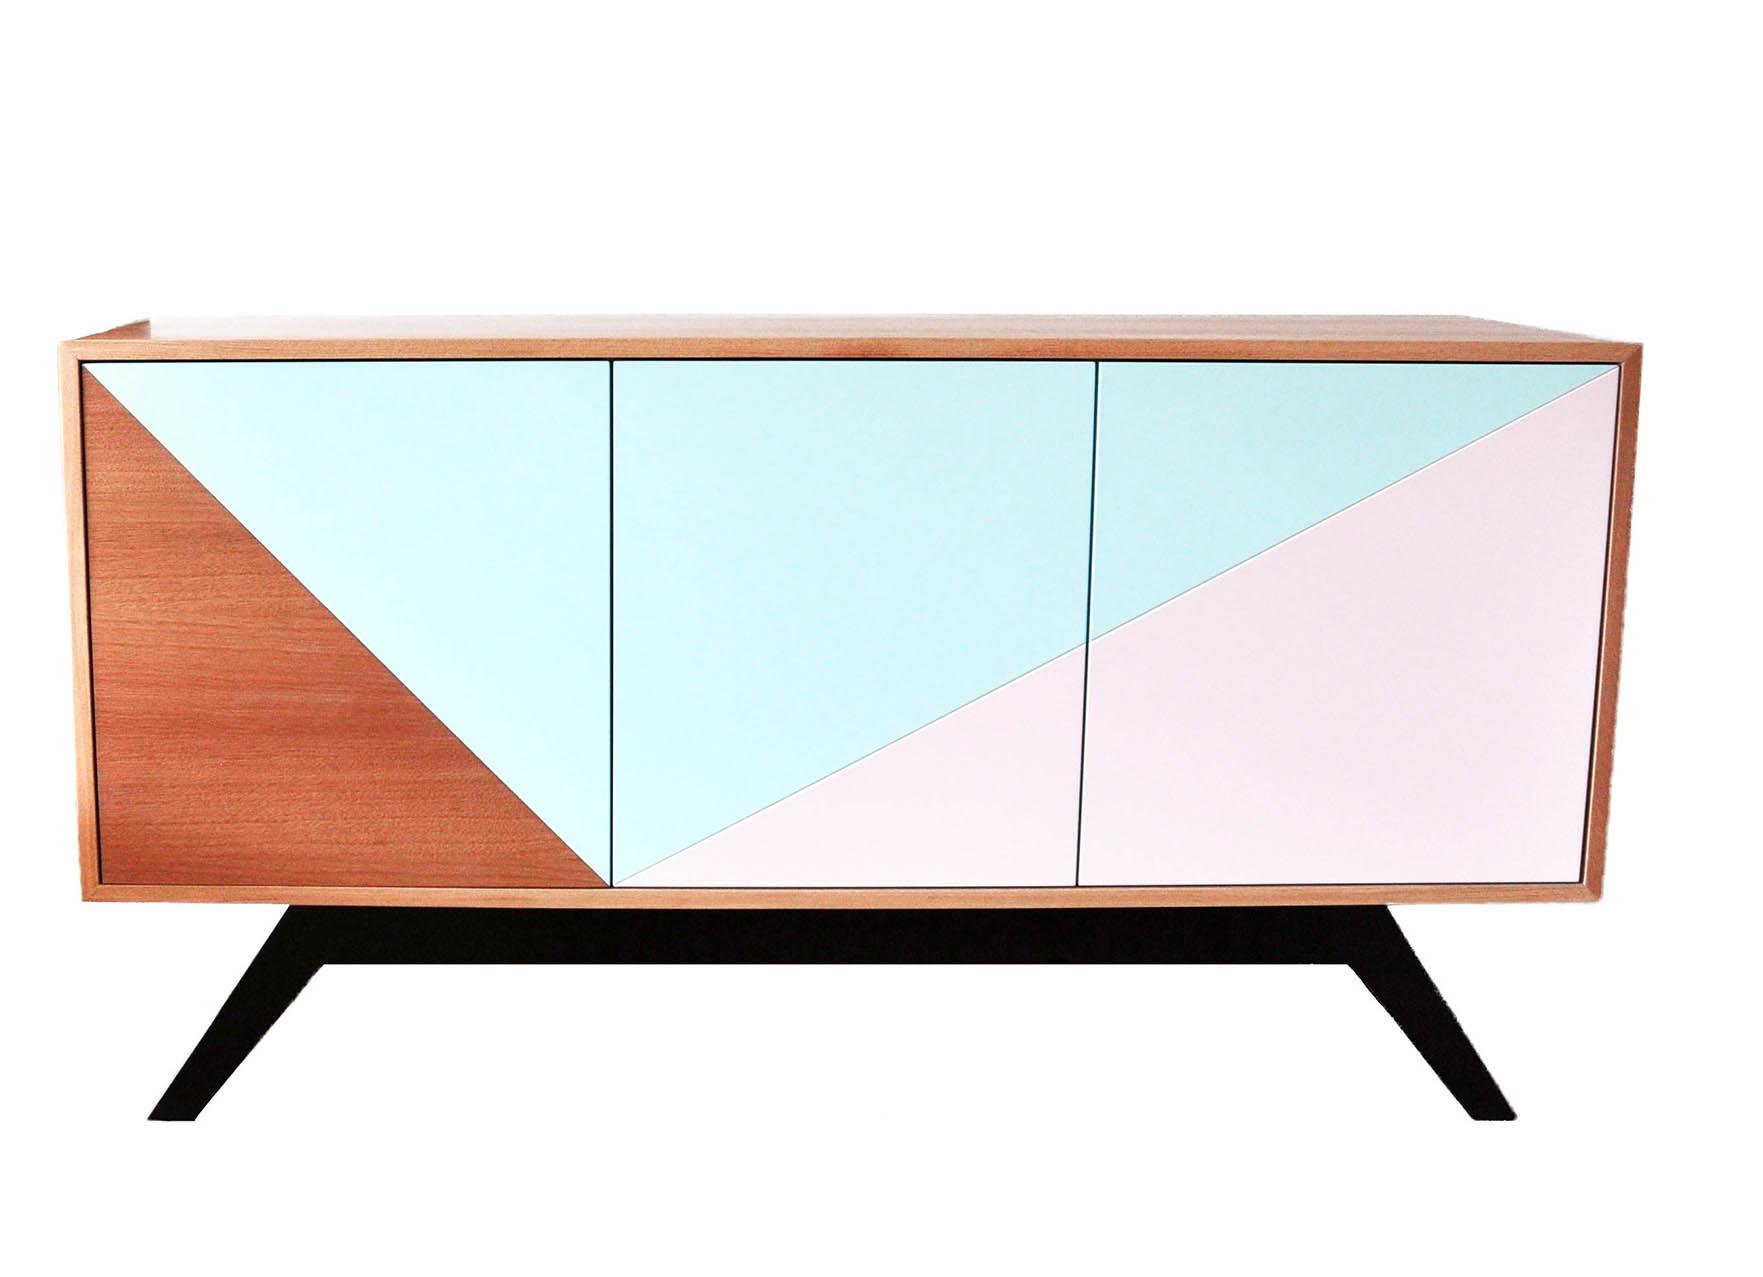 Design inspirowany peerelem